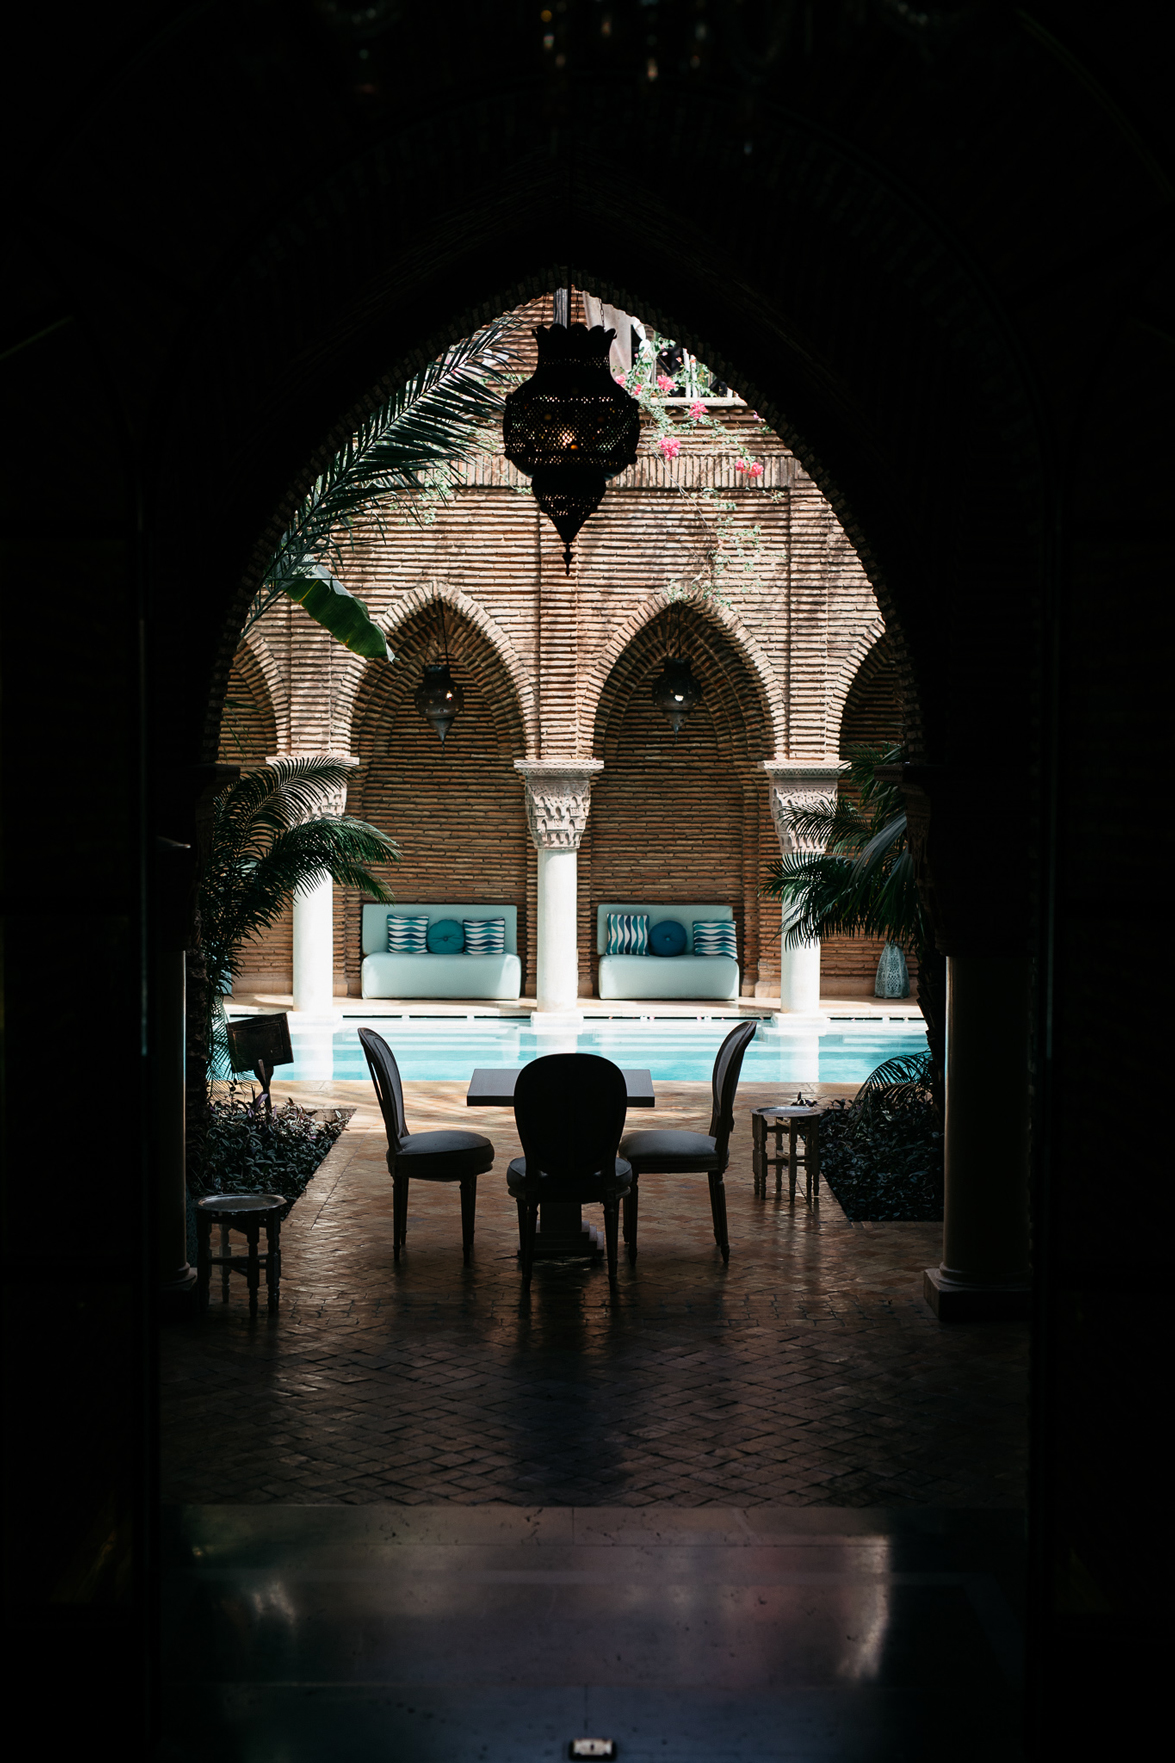 sug sean-marrakech_79.jpg